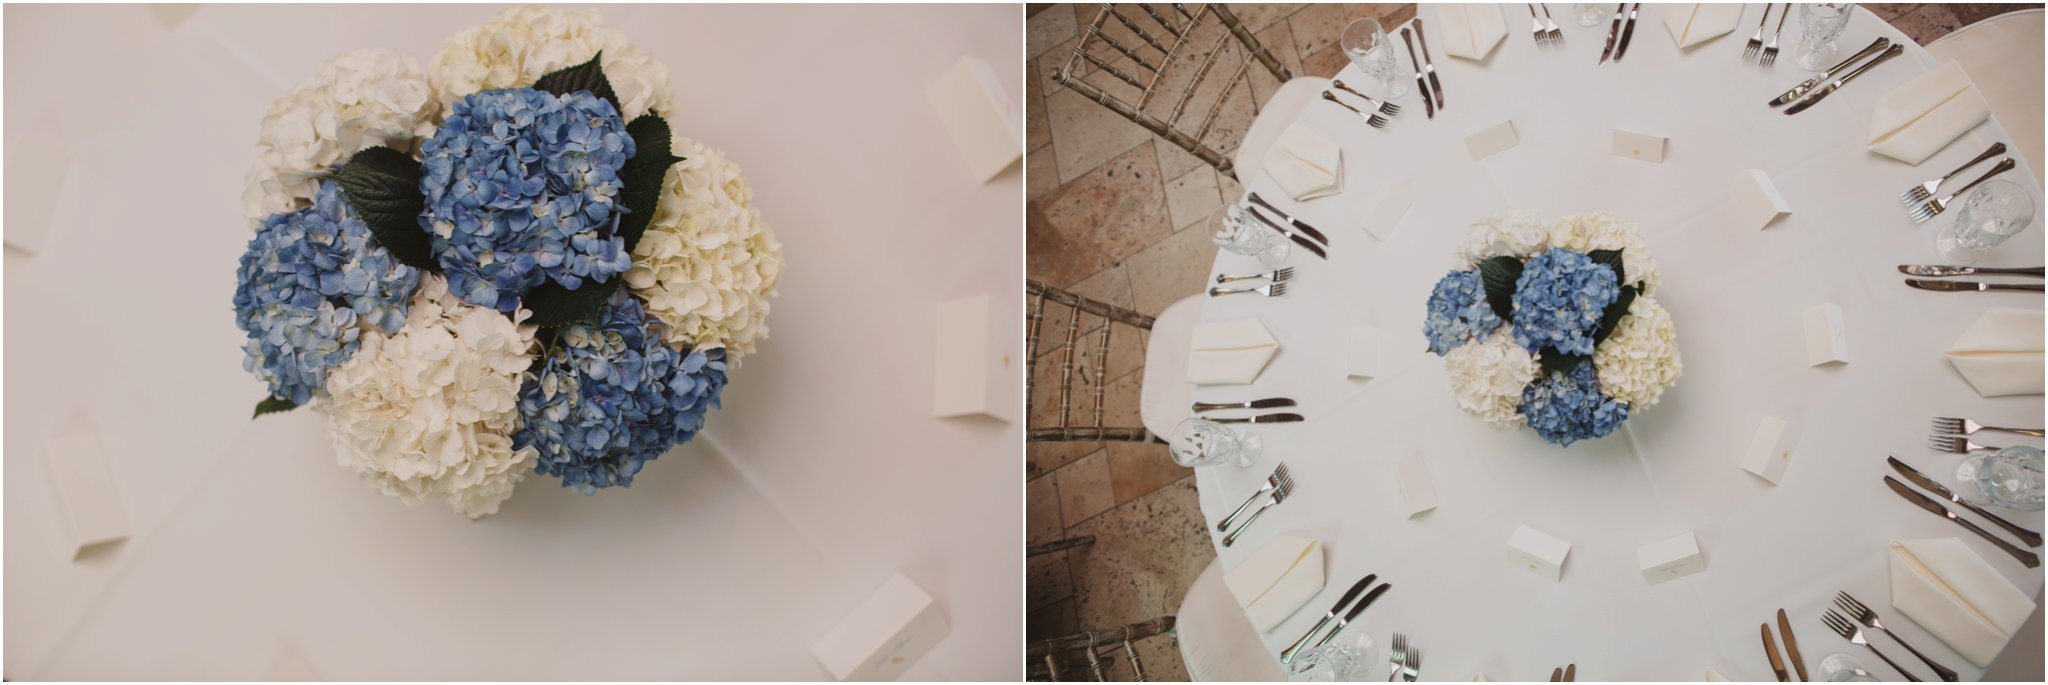 0003santa-fe-wedding-photographer_albuquerque-wedding-photographer_-southwest-wedding-photography_-blue-rose-studio